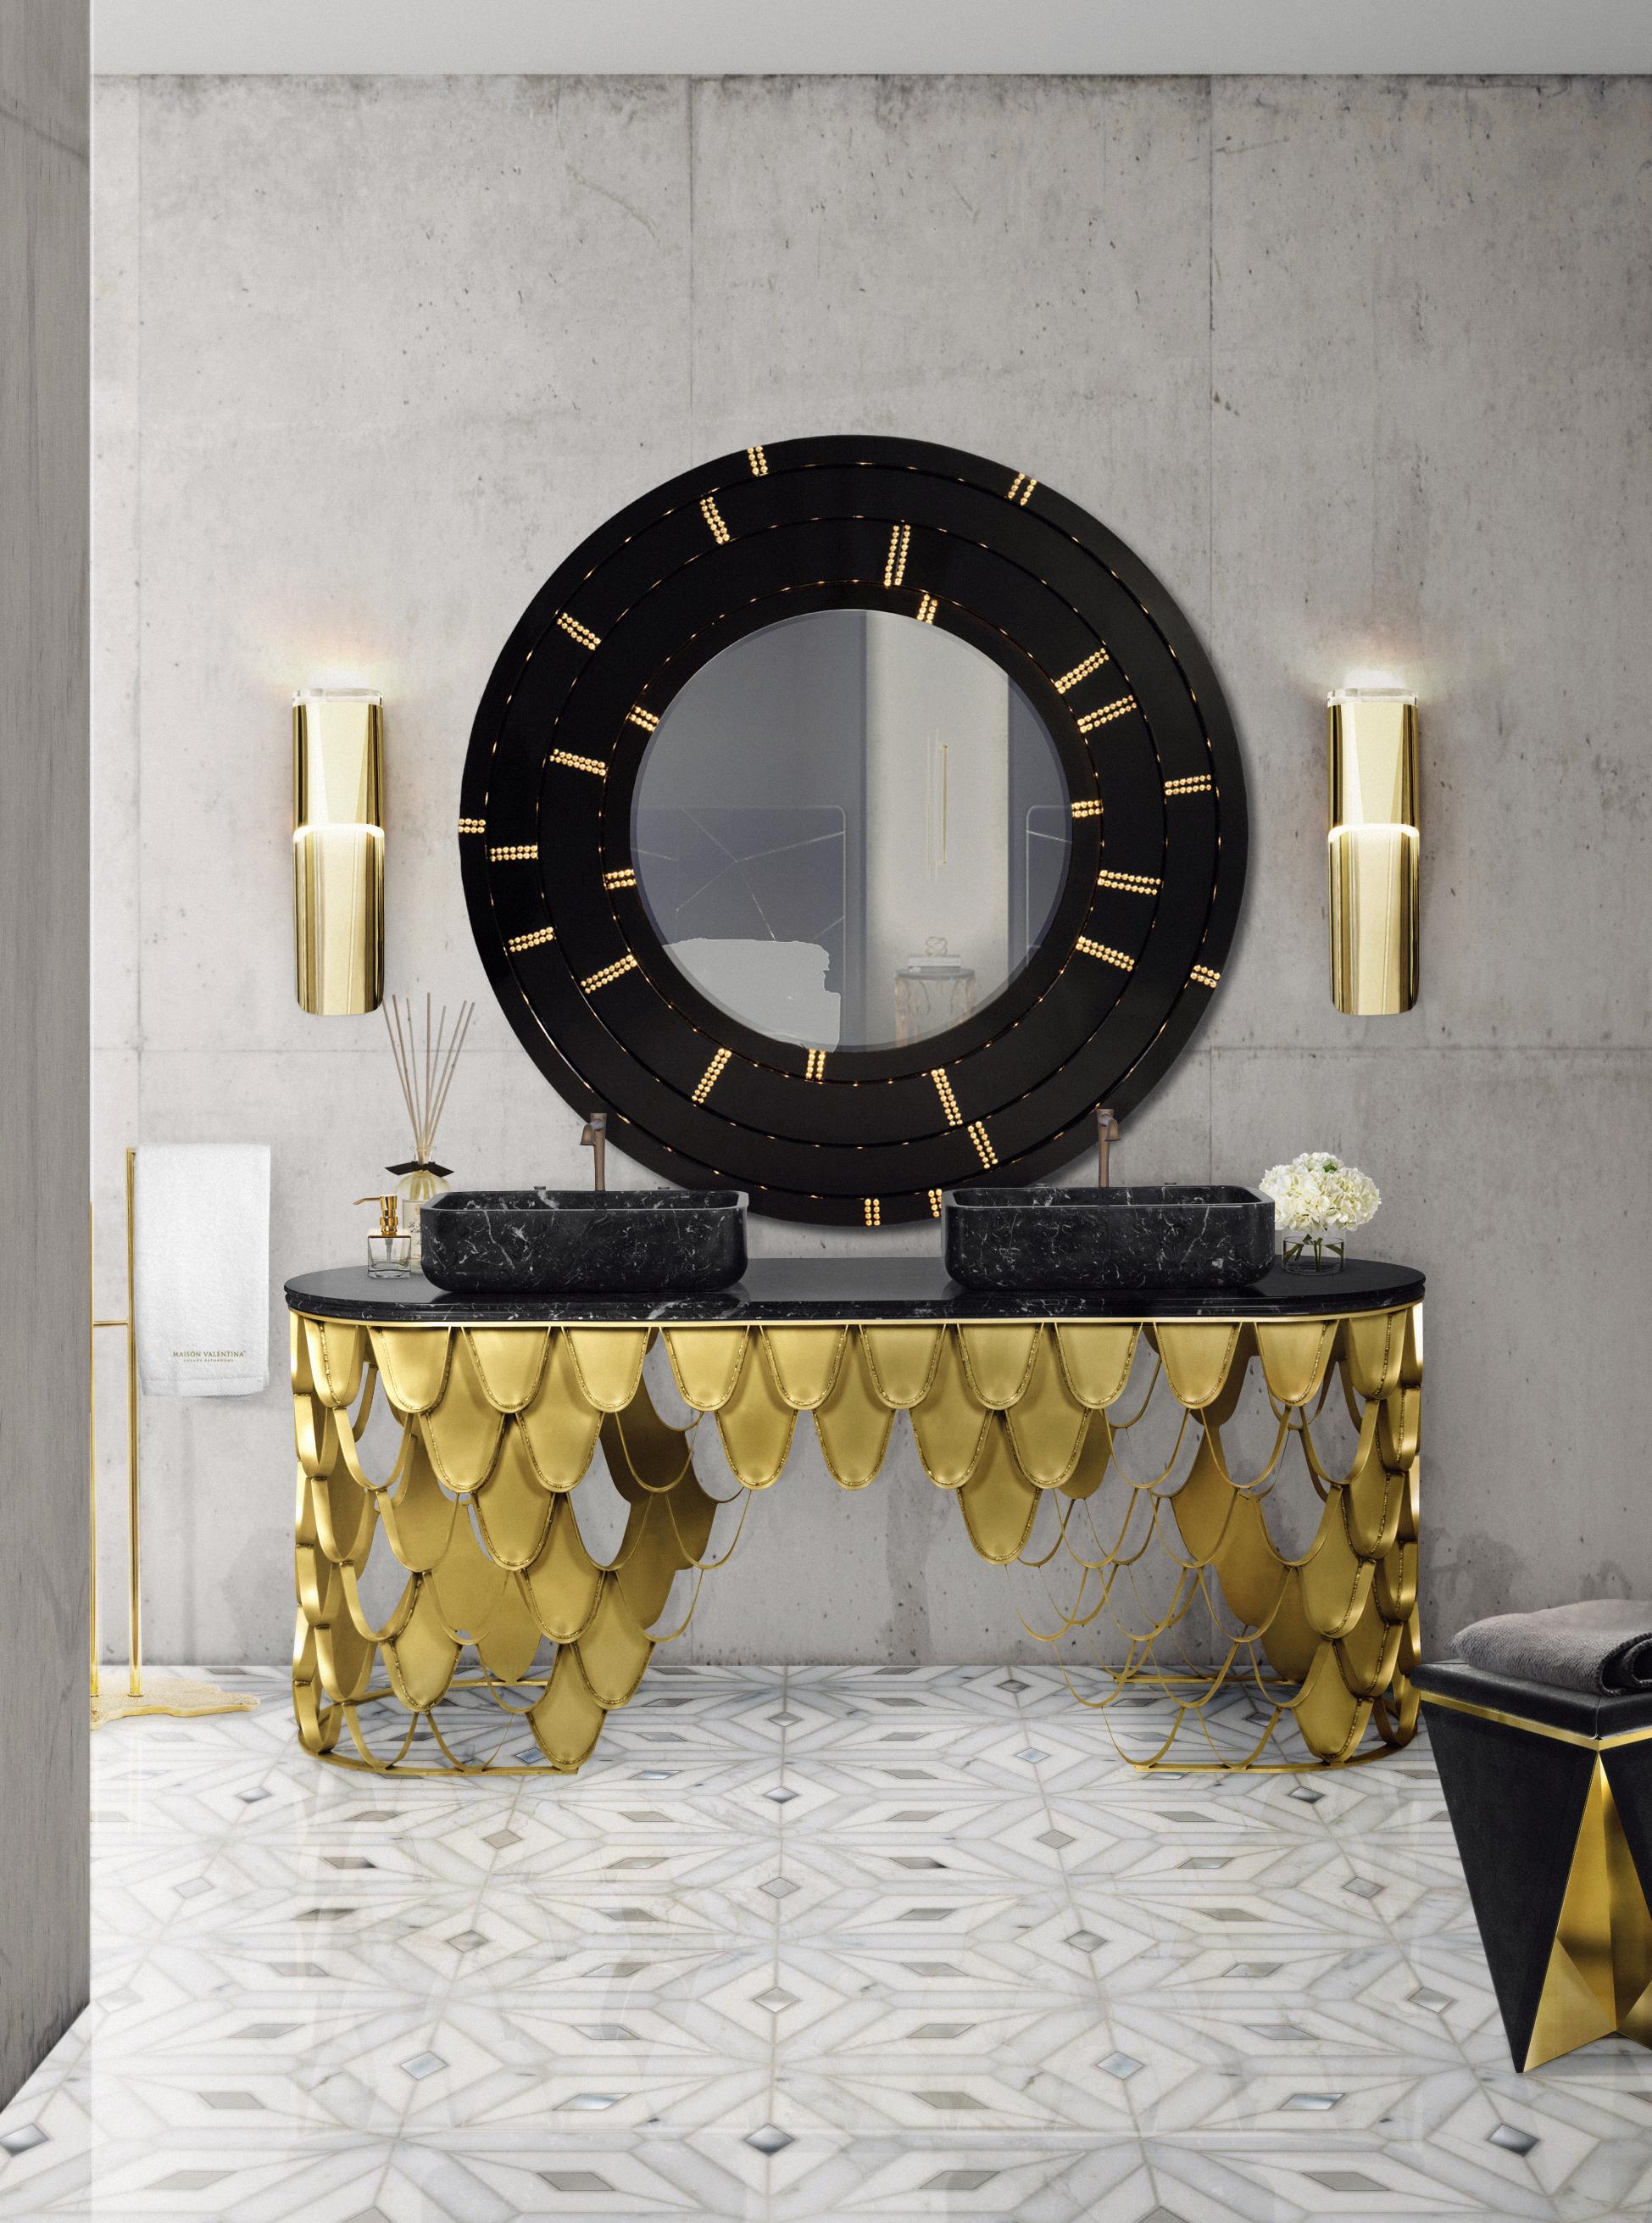 Impressive Washbasins Take Inspiration From These Impressive Washbasins – Part III 29 koi washbasin blaze mirror eden towel rack HR 2